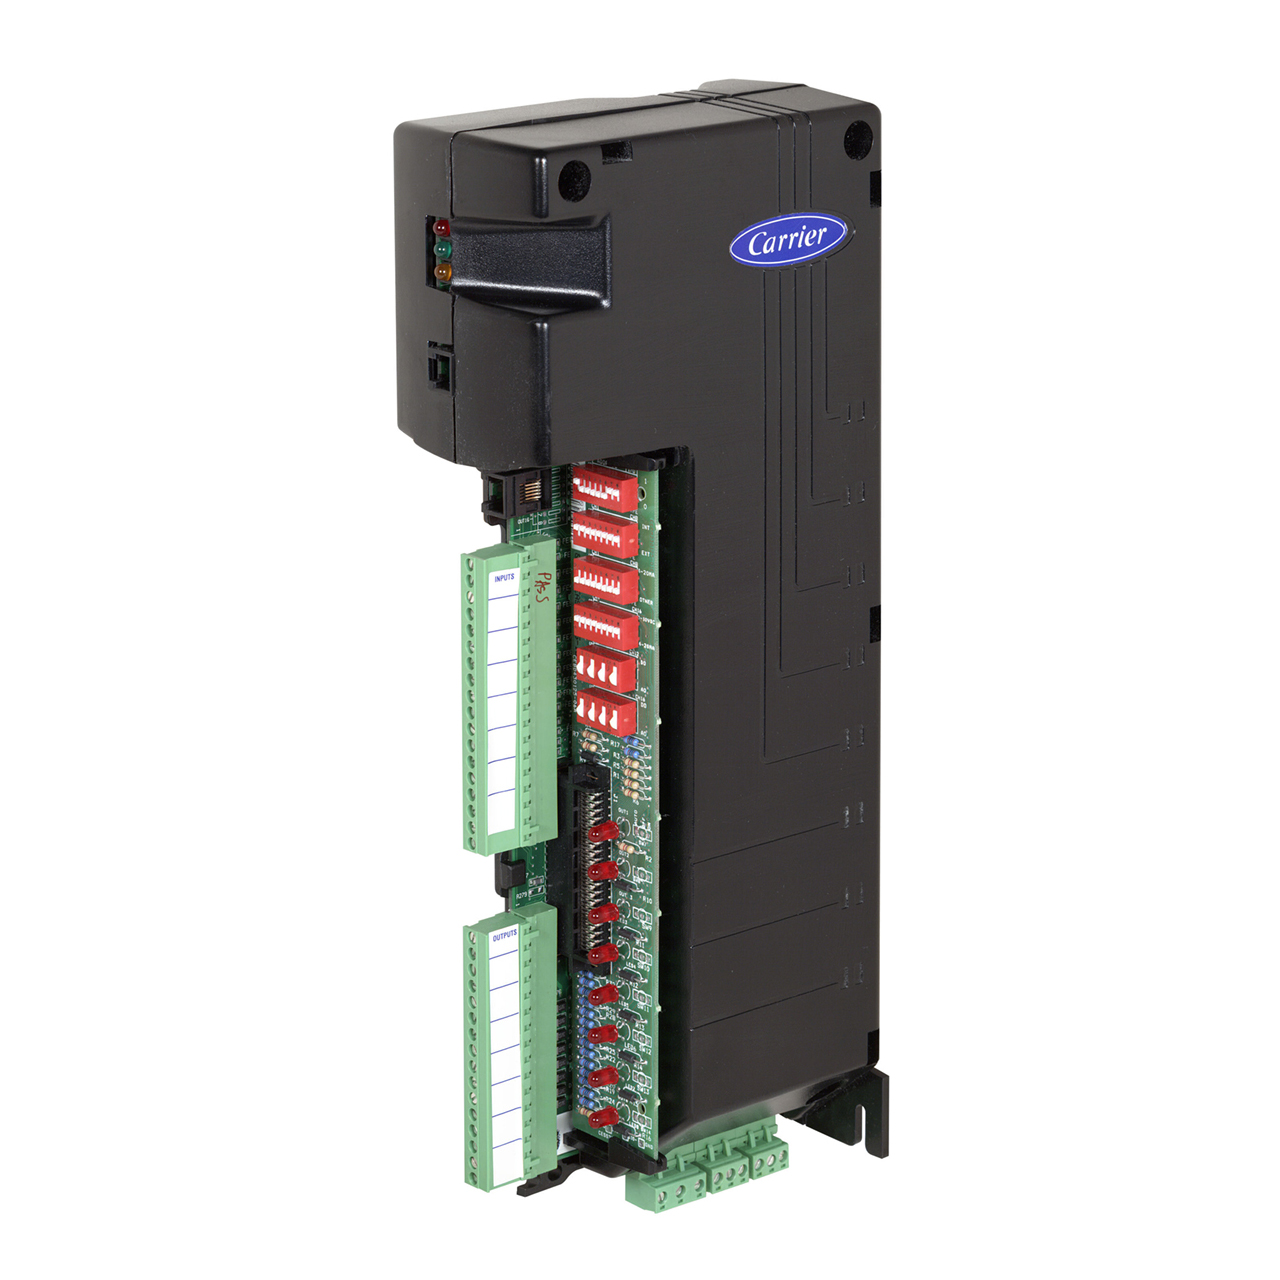 carrier-CEPL130530-10-R-general-purpose-controller